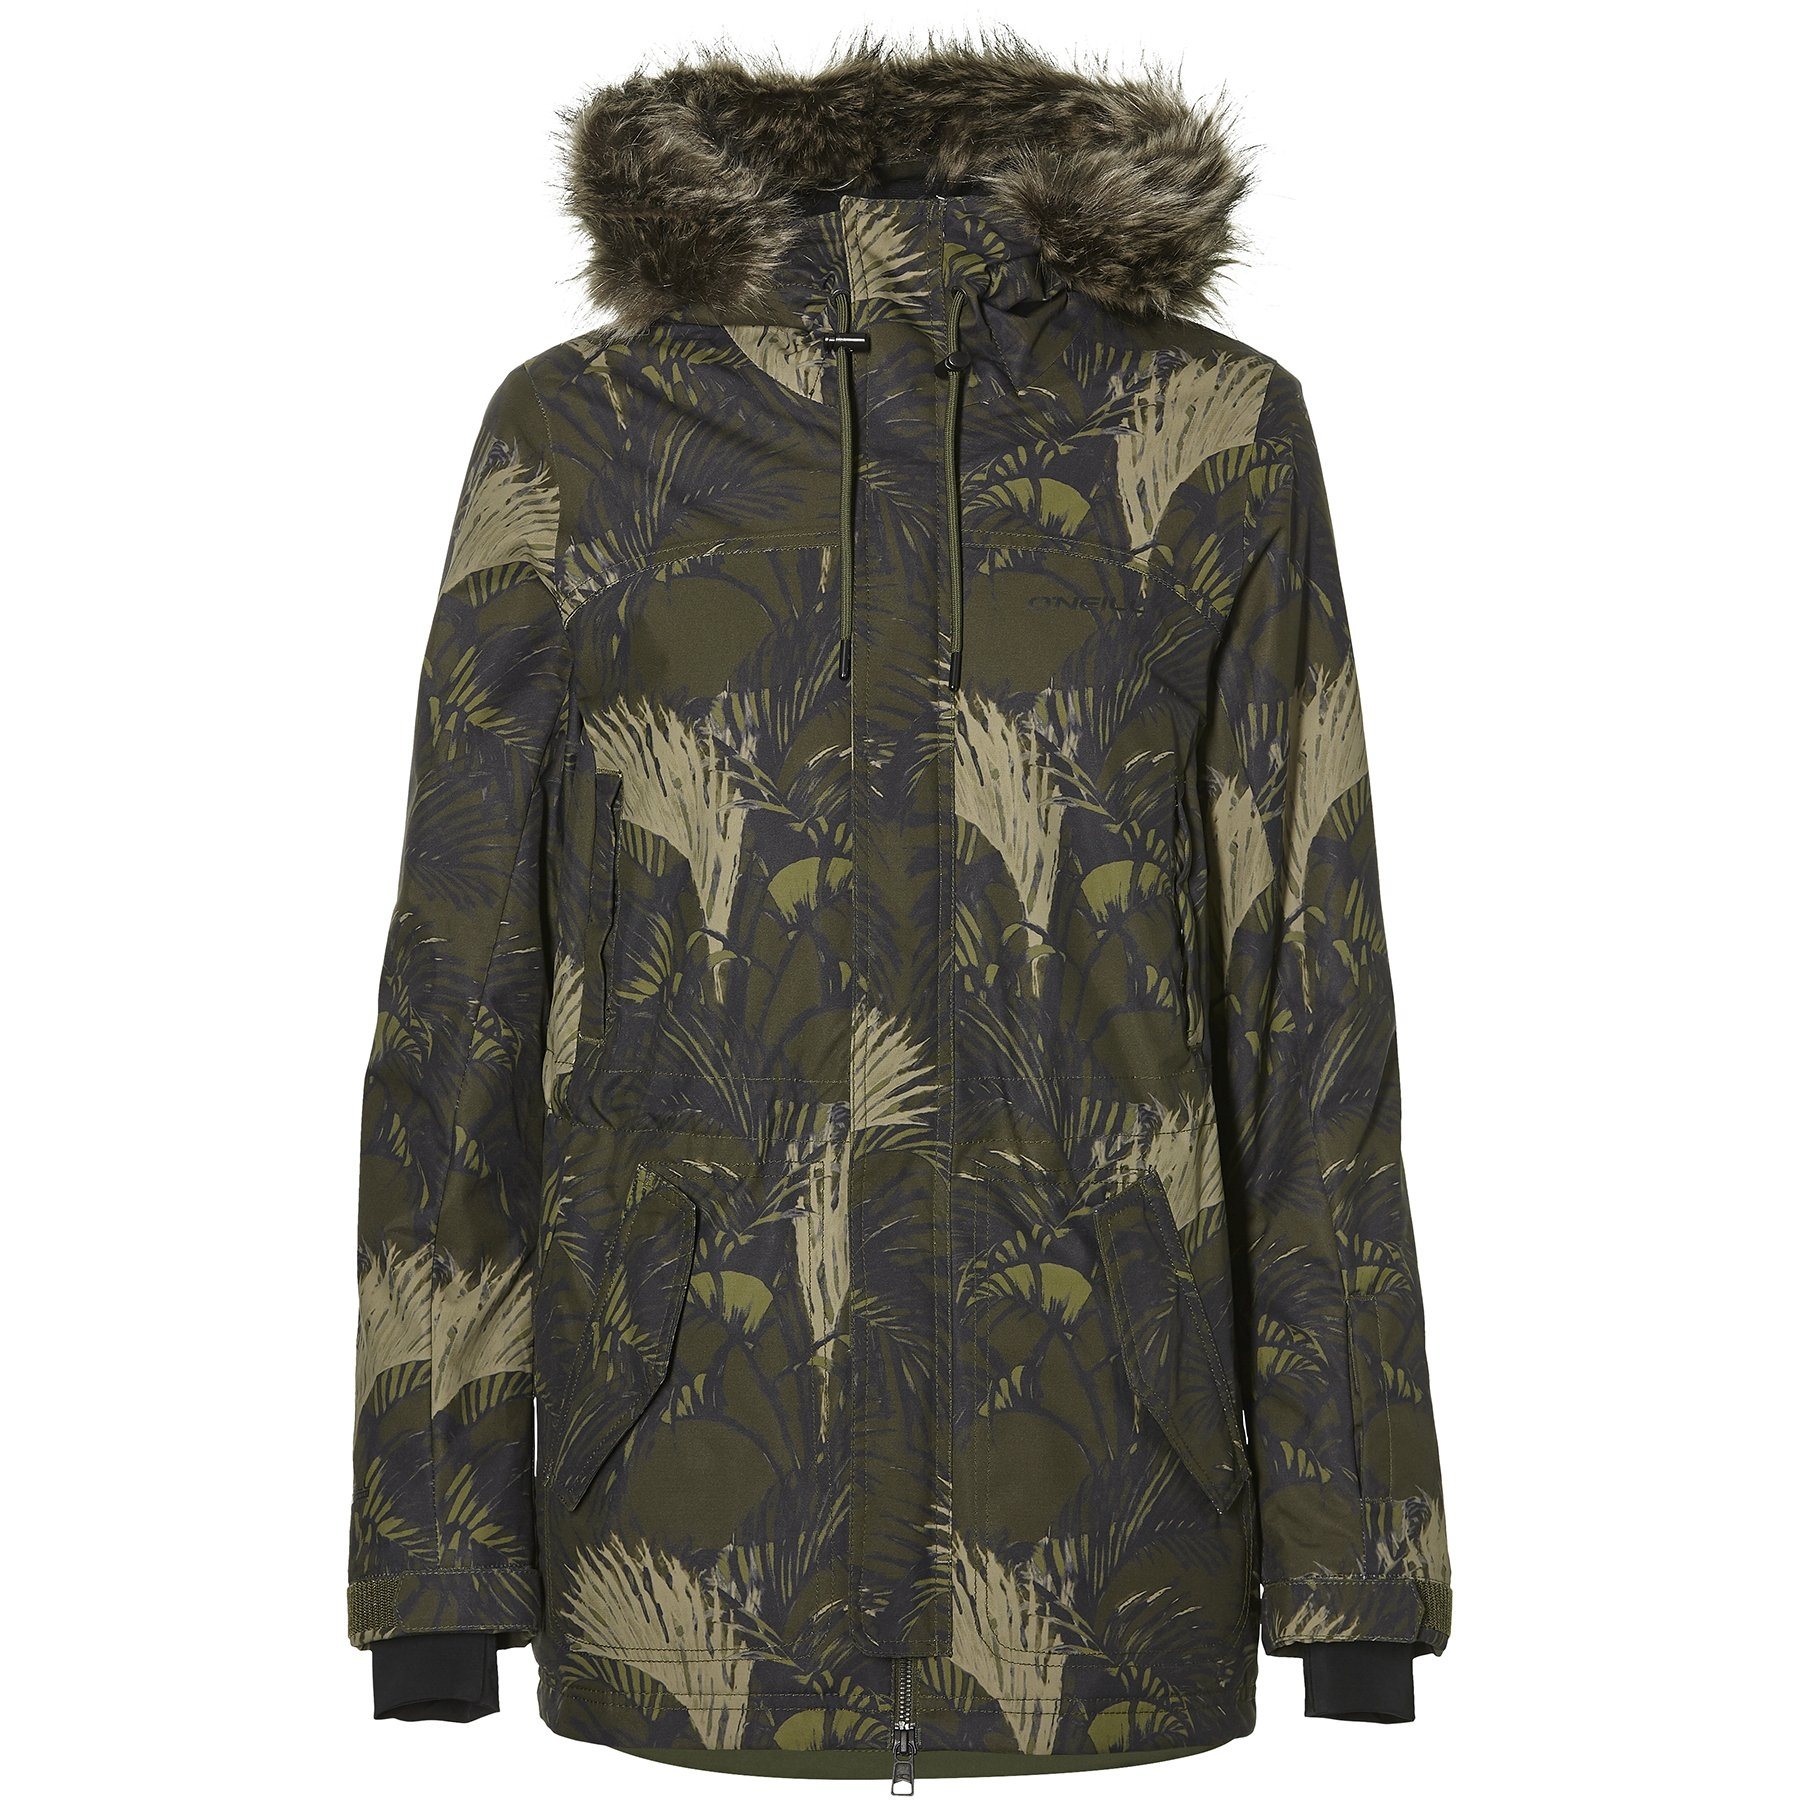 O'Neill Jackets Snow »Hybrid cluster iii jacket« - gratis ruilen op otto.nl